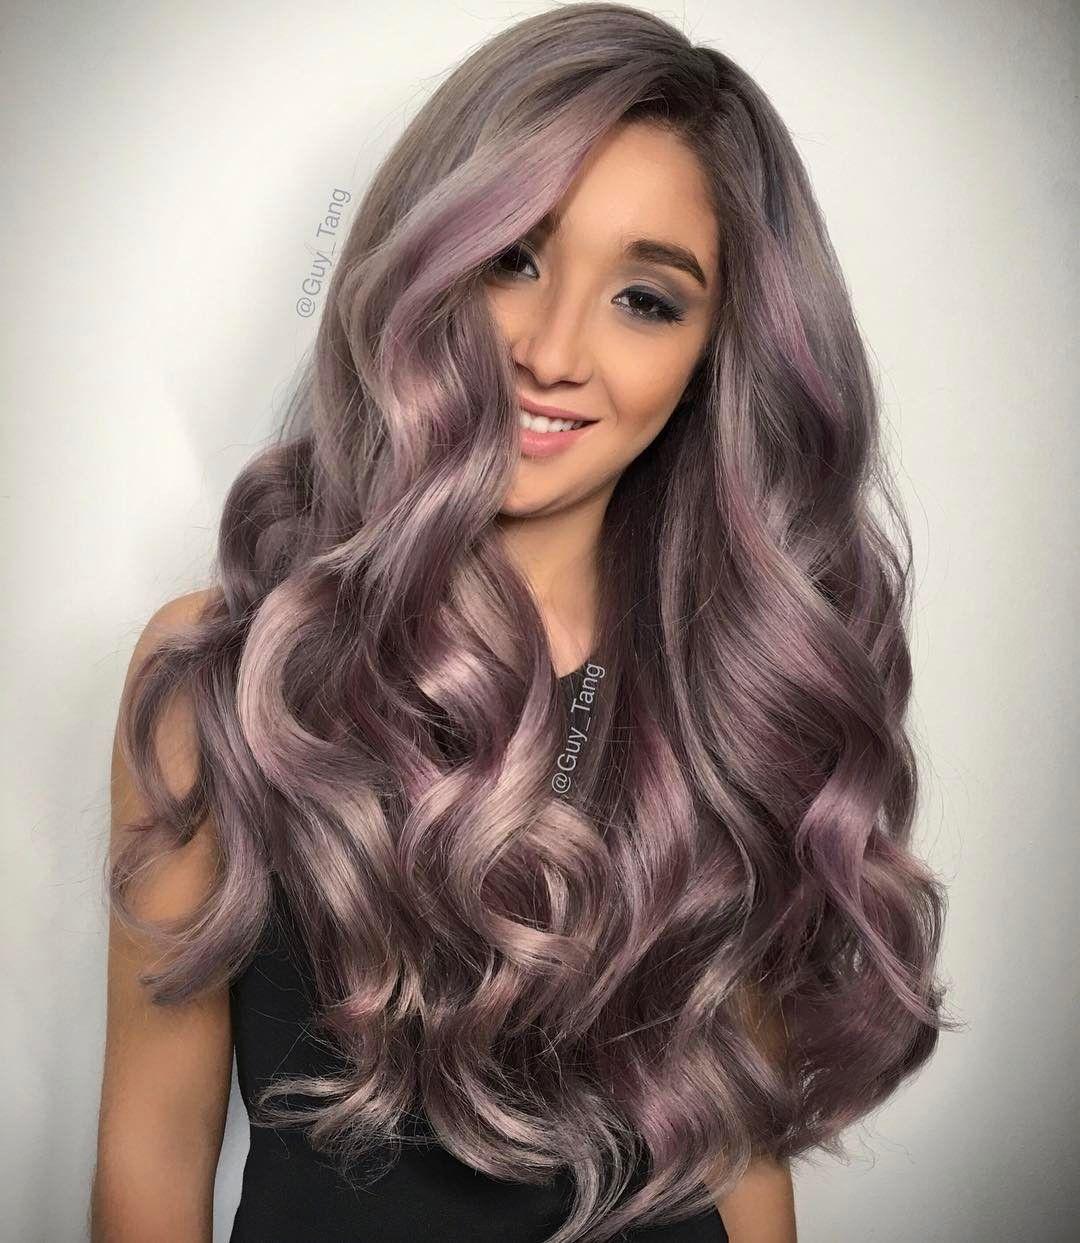 Instagram Photo By Celina Schacht Jun 7 2016 At 5 58pm Utc Hair Hair Styles Long Hair Styles